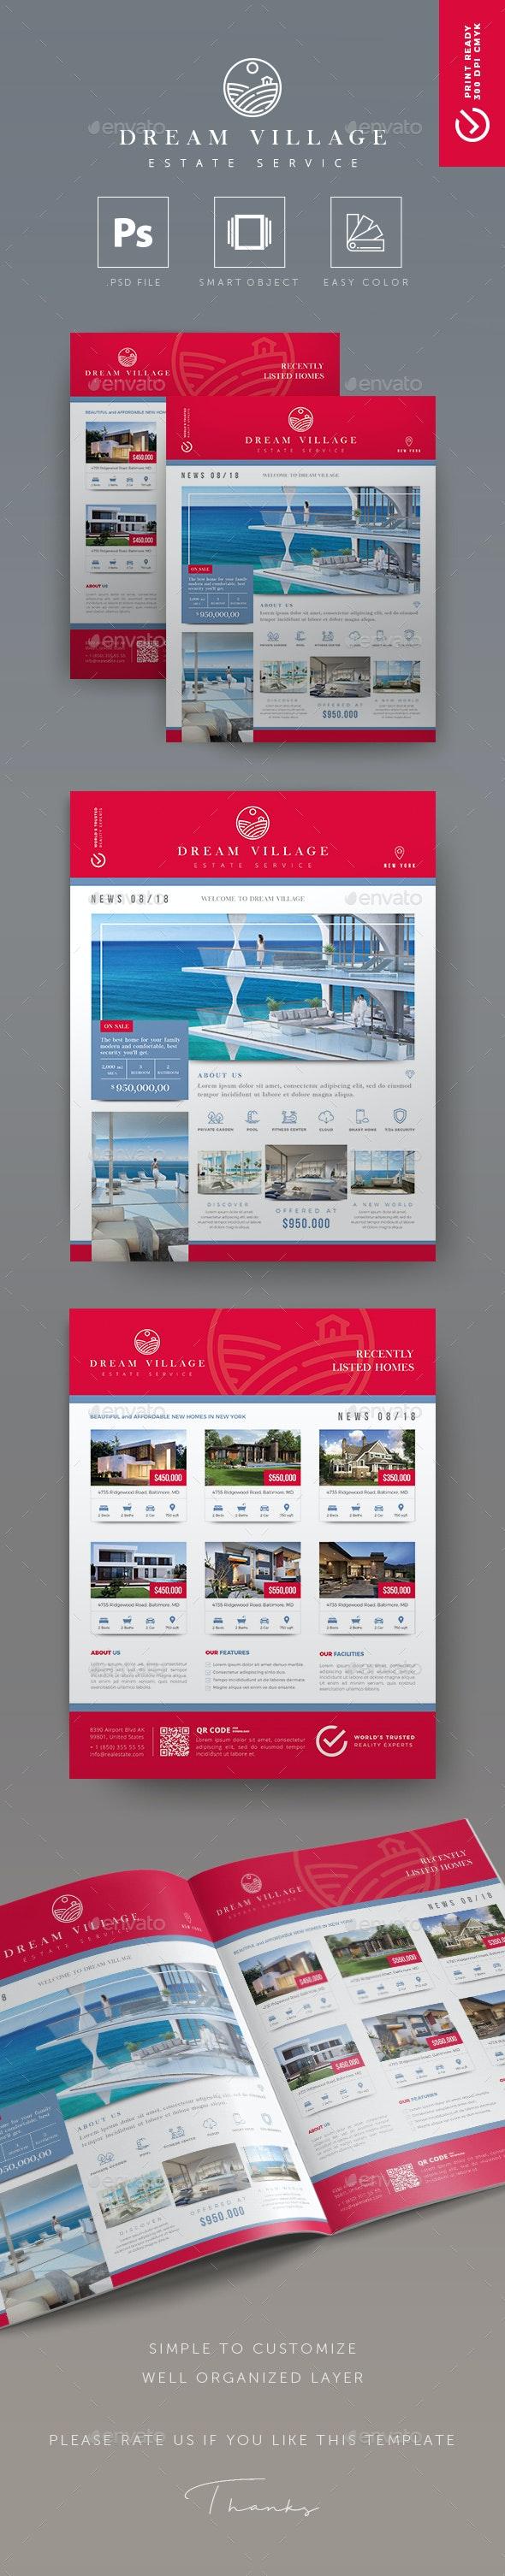 Dream Village - Creative Real Estate Flyer - Commerce Flyers